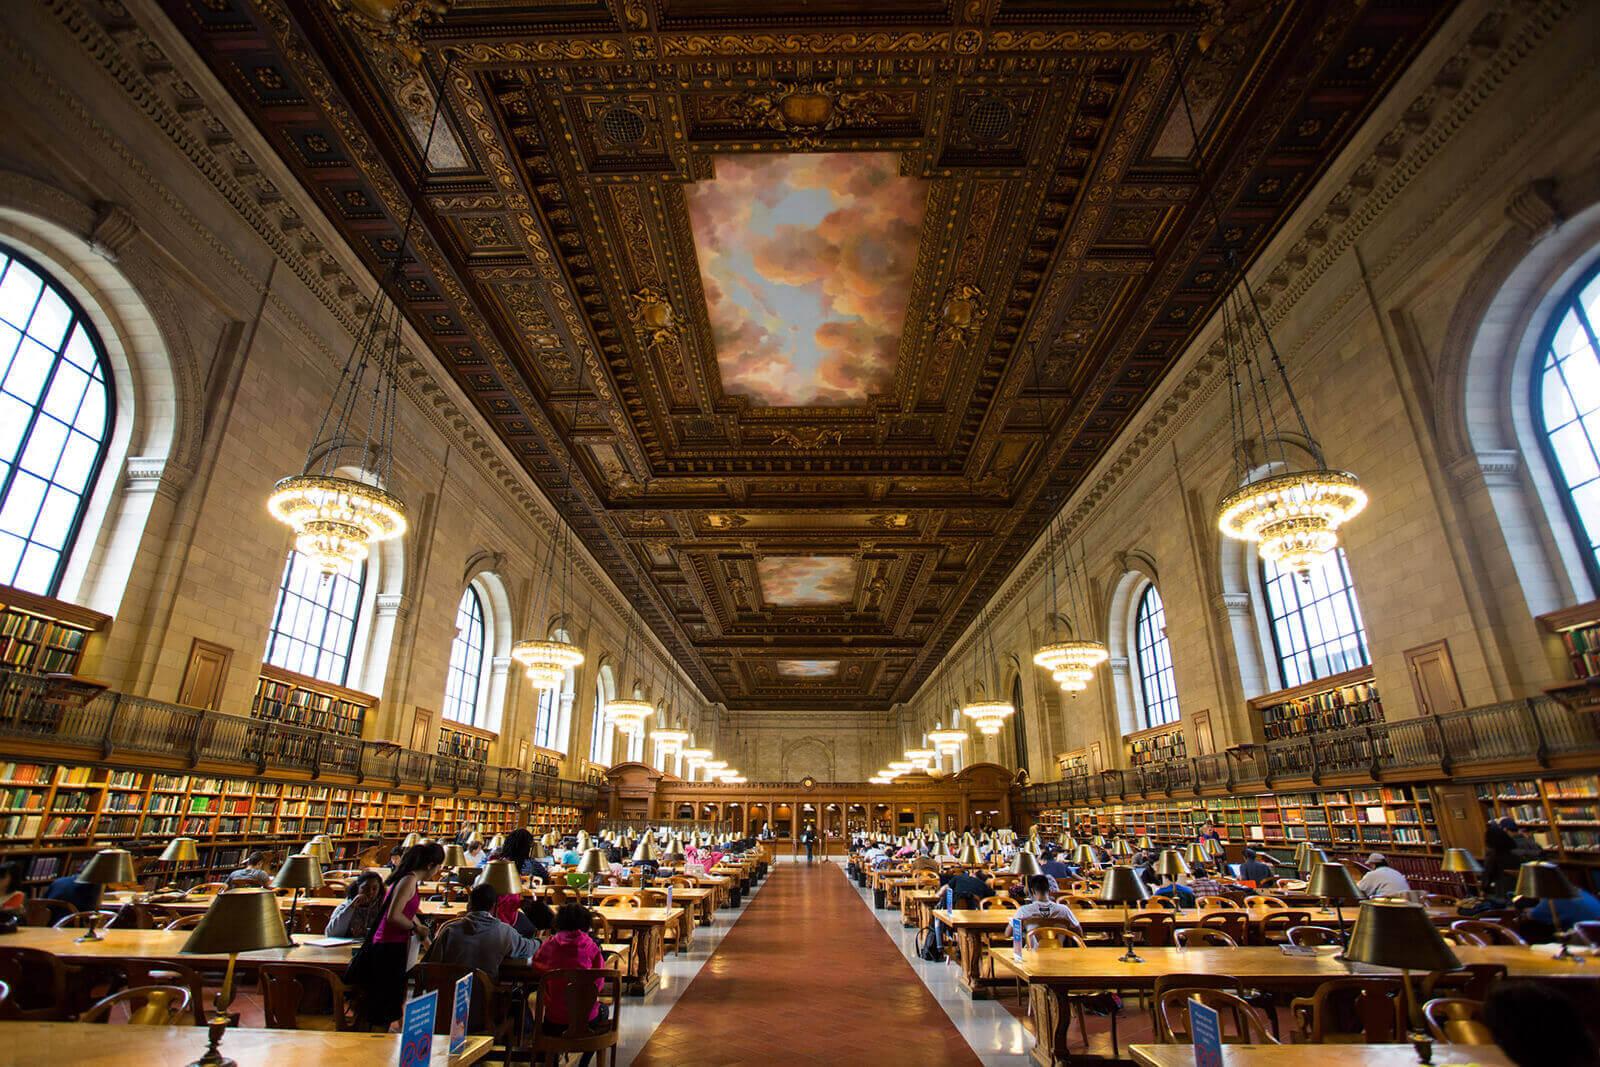 New York Public Library New York City NJ